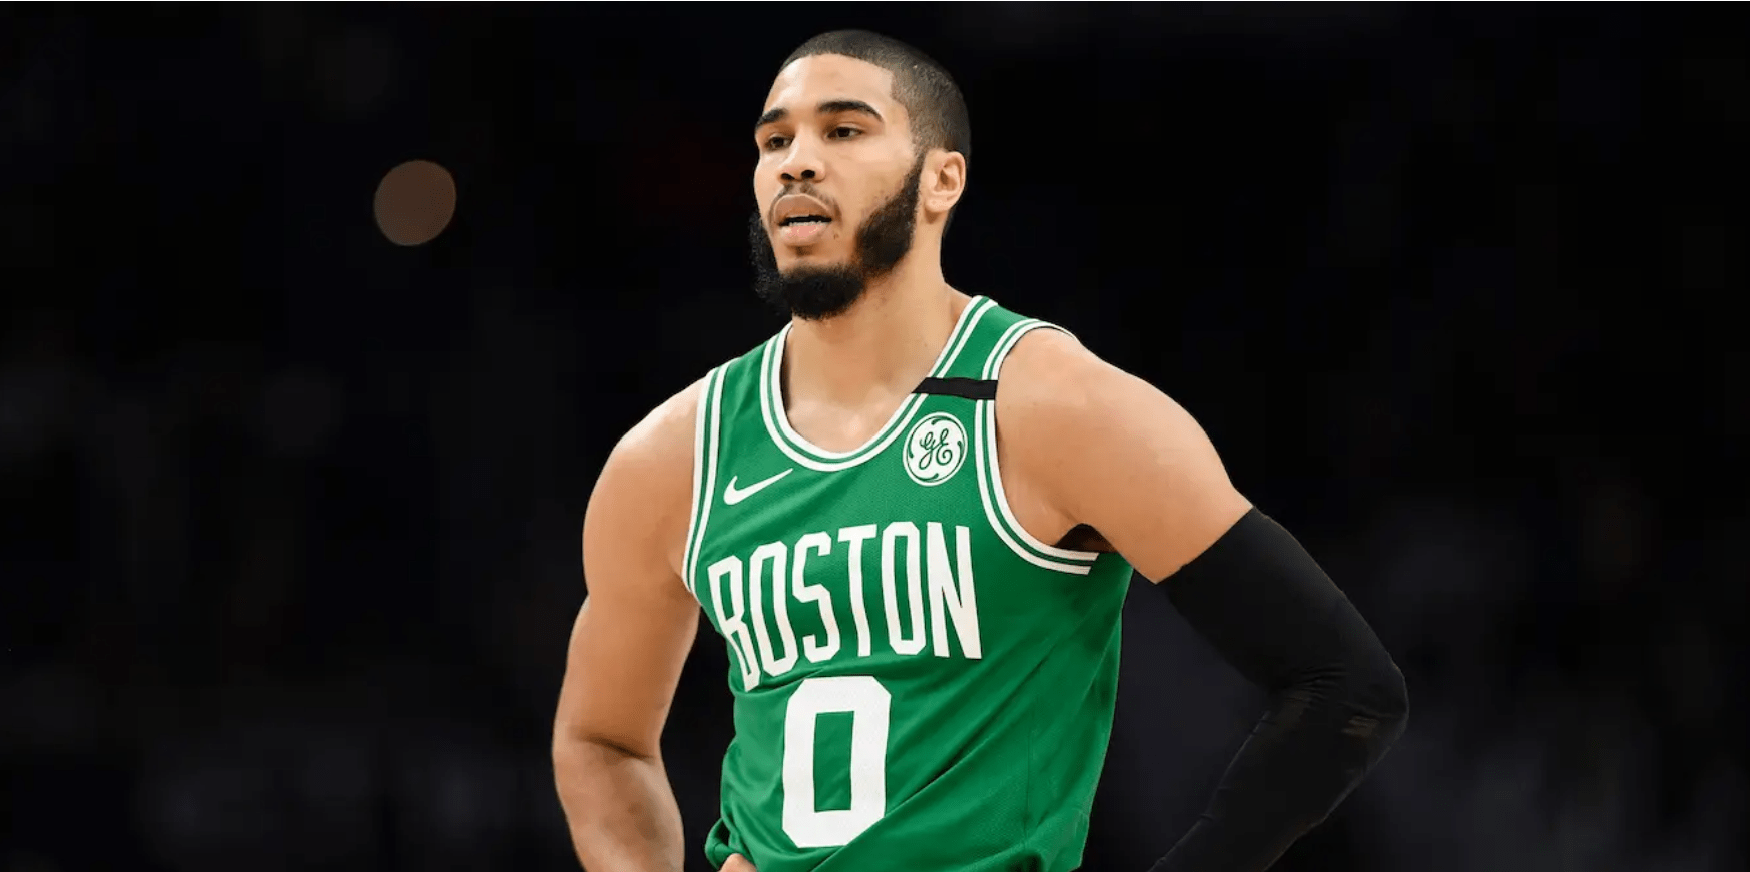 Boston's Real MVP: The Barbershop